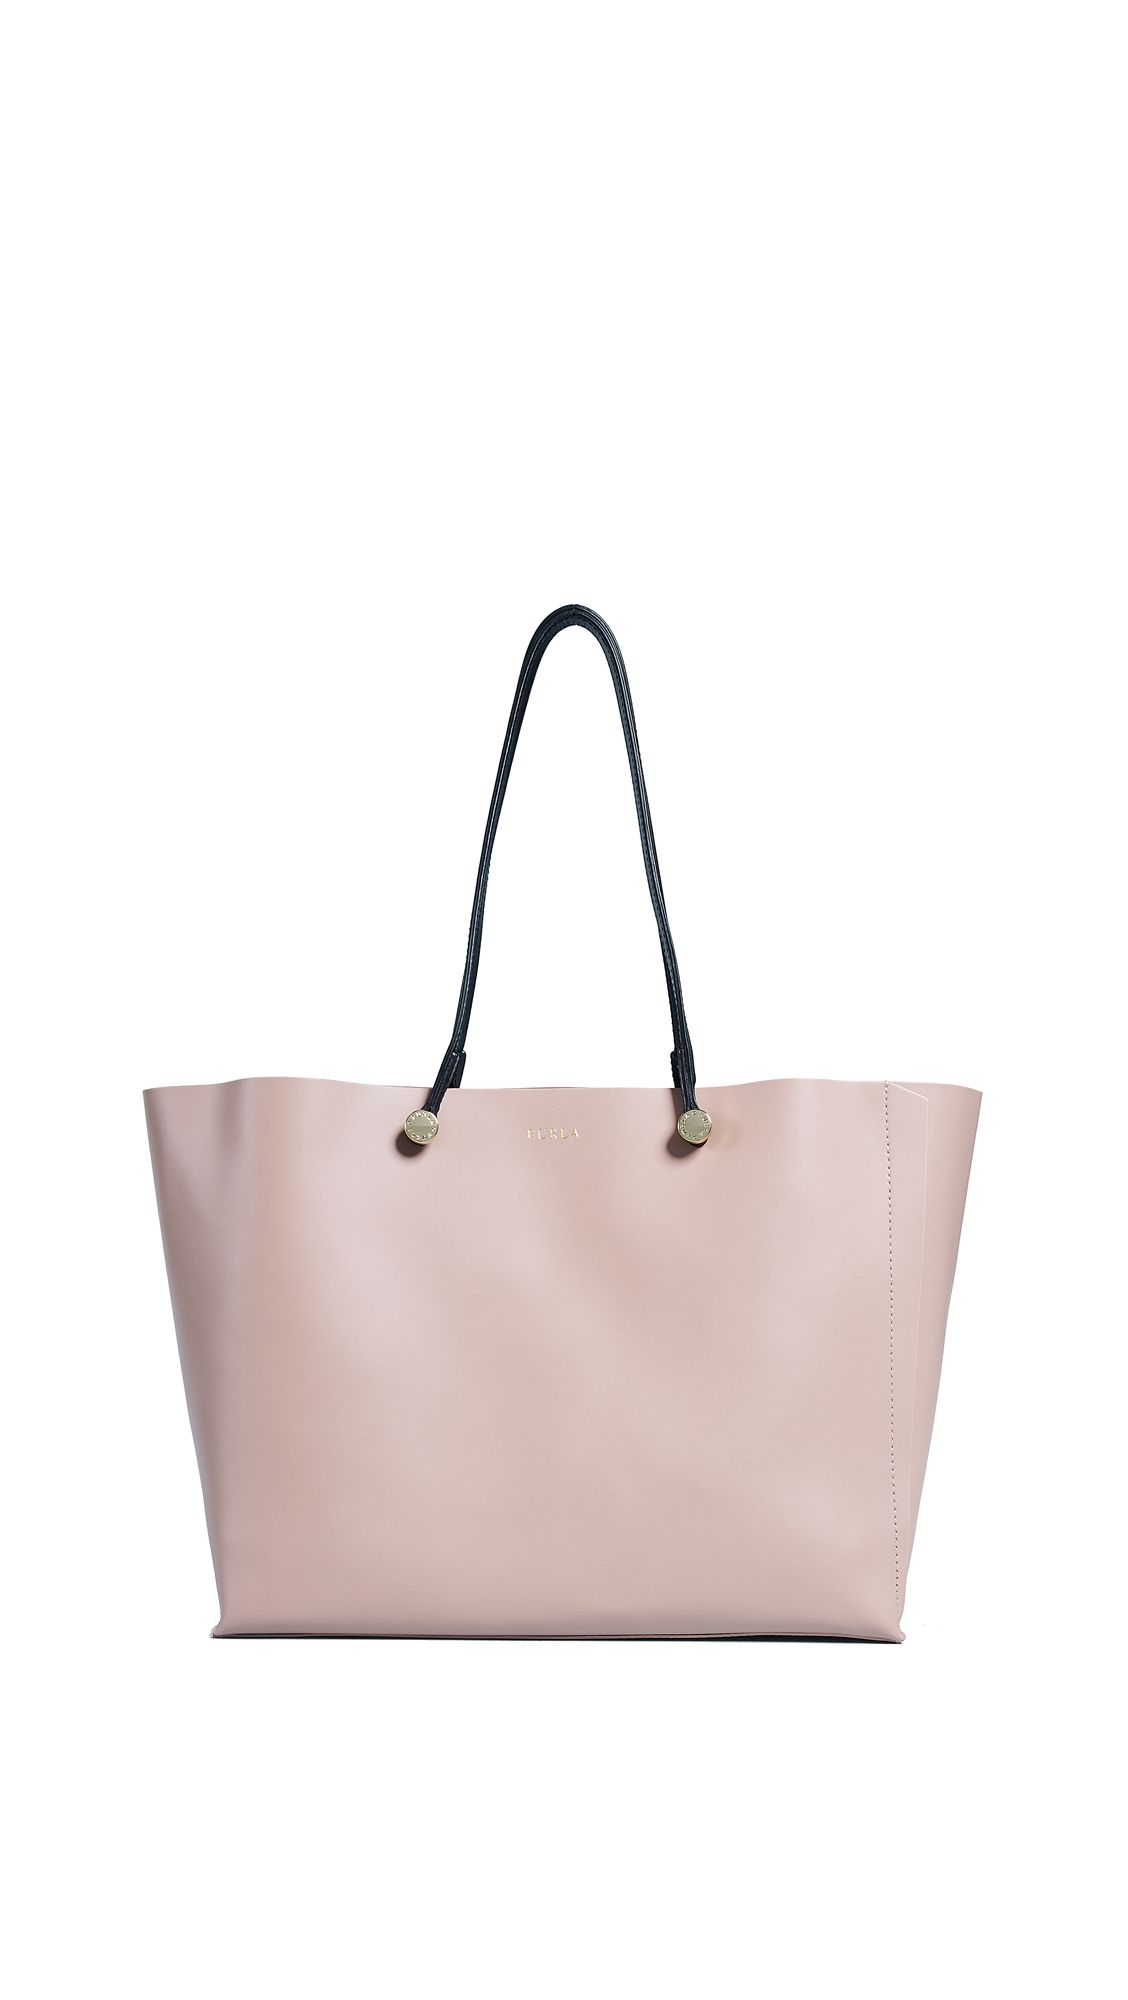 7ebfdf4ada70a FURLA EDEN MEDIUM TOTE.  furla  bags  leather  hand bags  tote ...